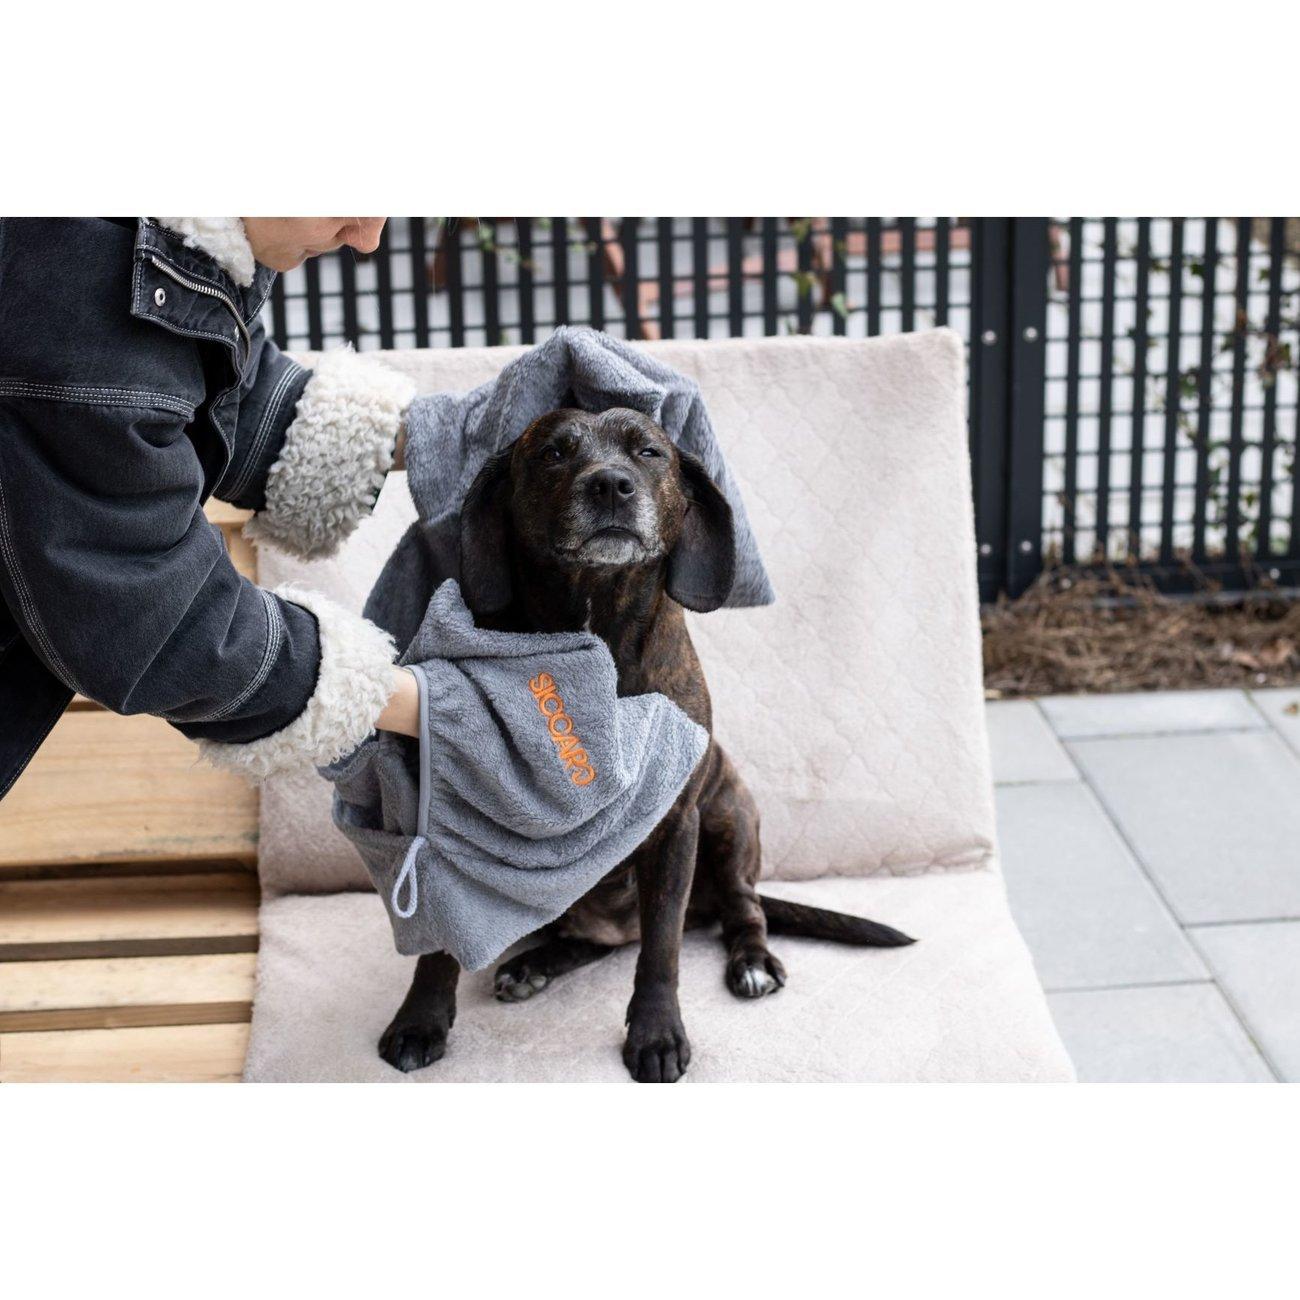 SICCARO Handtuch EasyDry Towel für Hunde, Bild 2